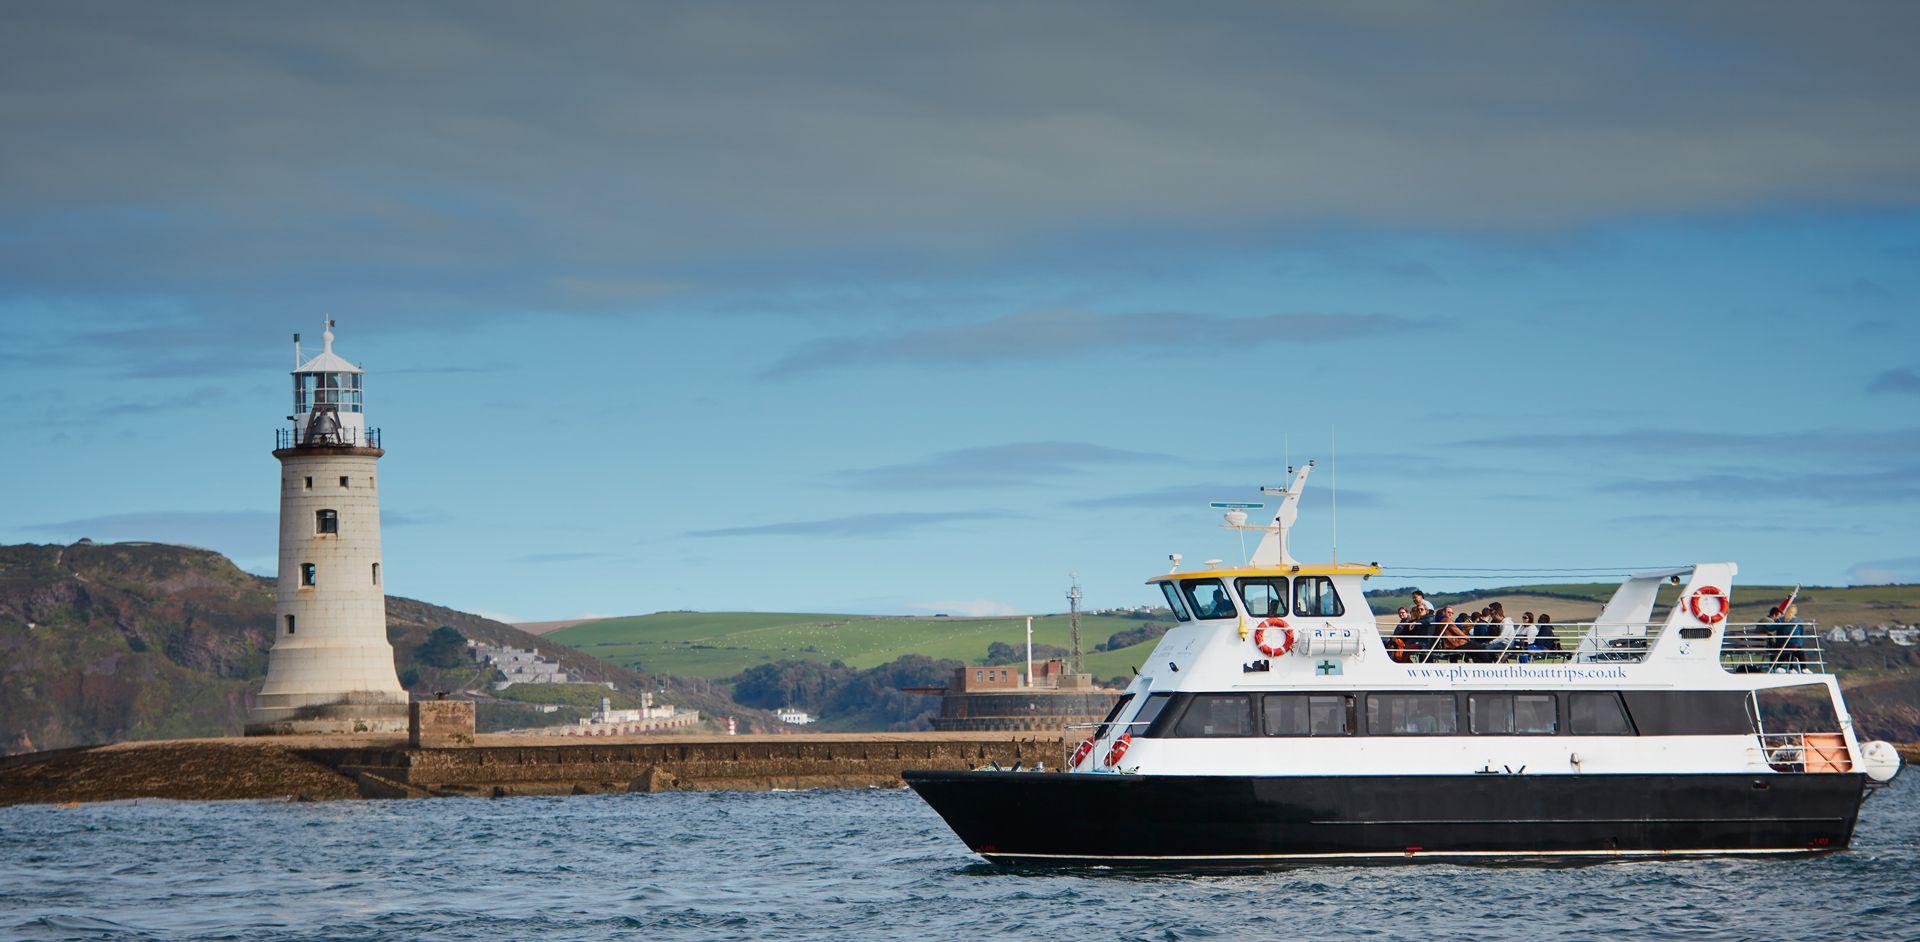 Plymouth Boat Trips Cruising - Slide Six